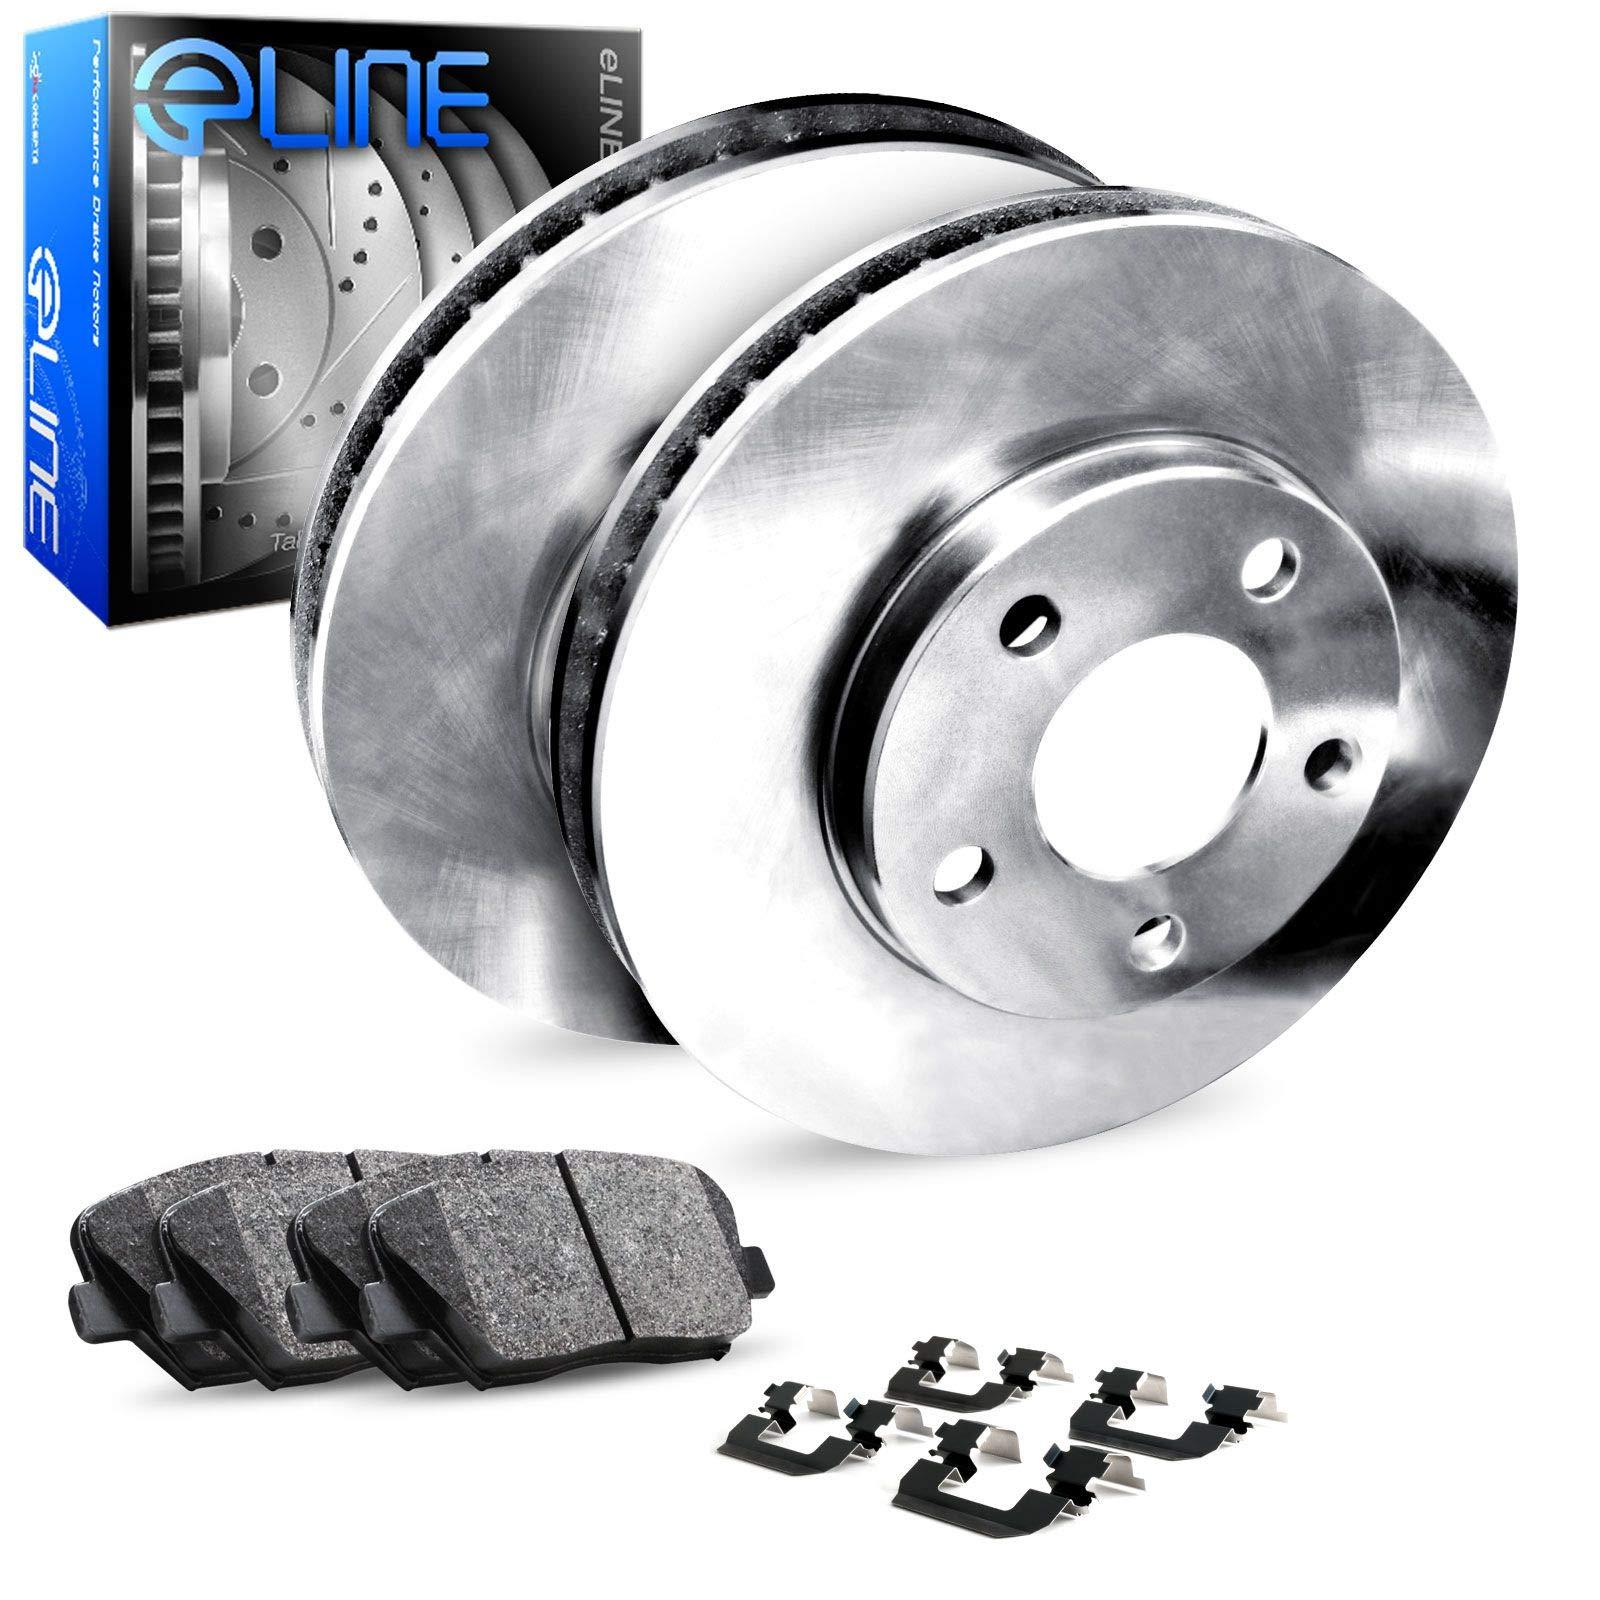 Prime Choice Auto Parts SCD1012-PR64113RL Pair of Performance Rotors and Premium Ceramic Brake Pads